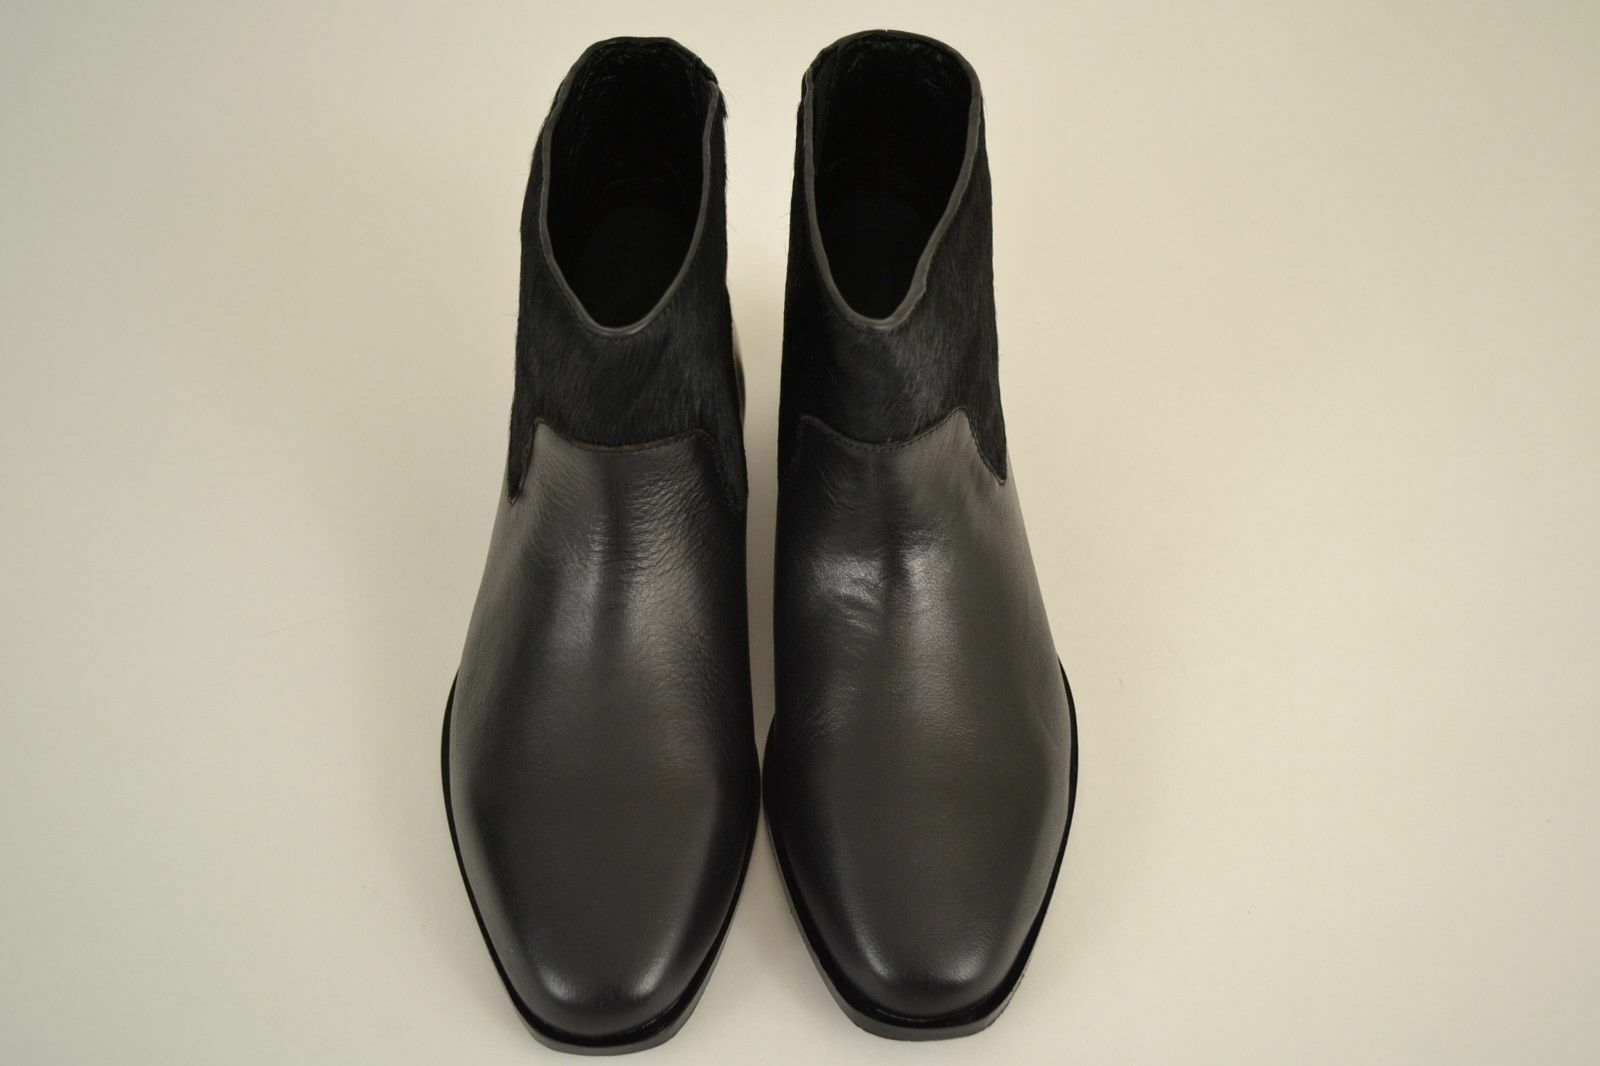 Saint & Libertine Damens Schuhes Trinket Blk Vachetta Pony Hair 7.5